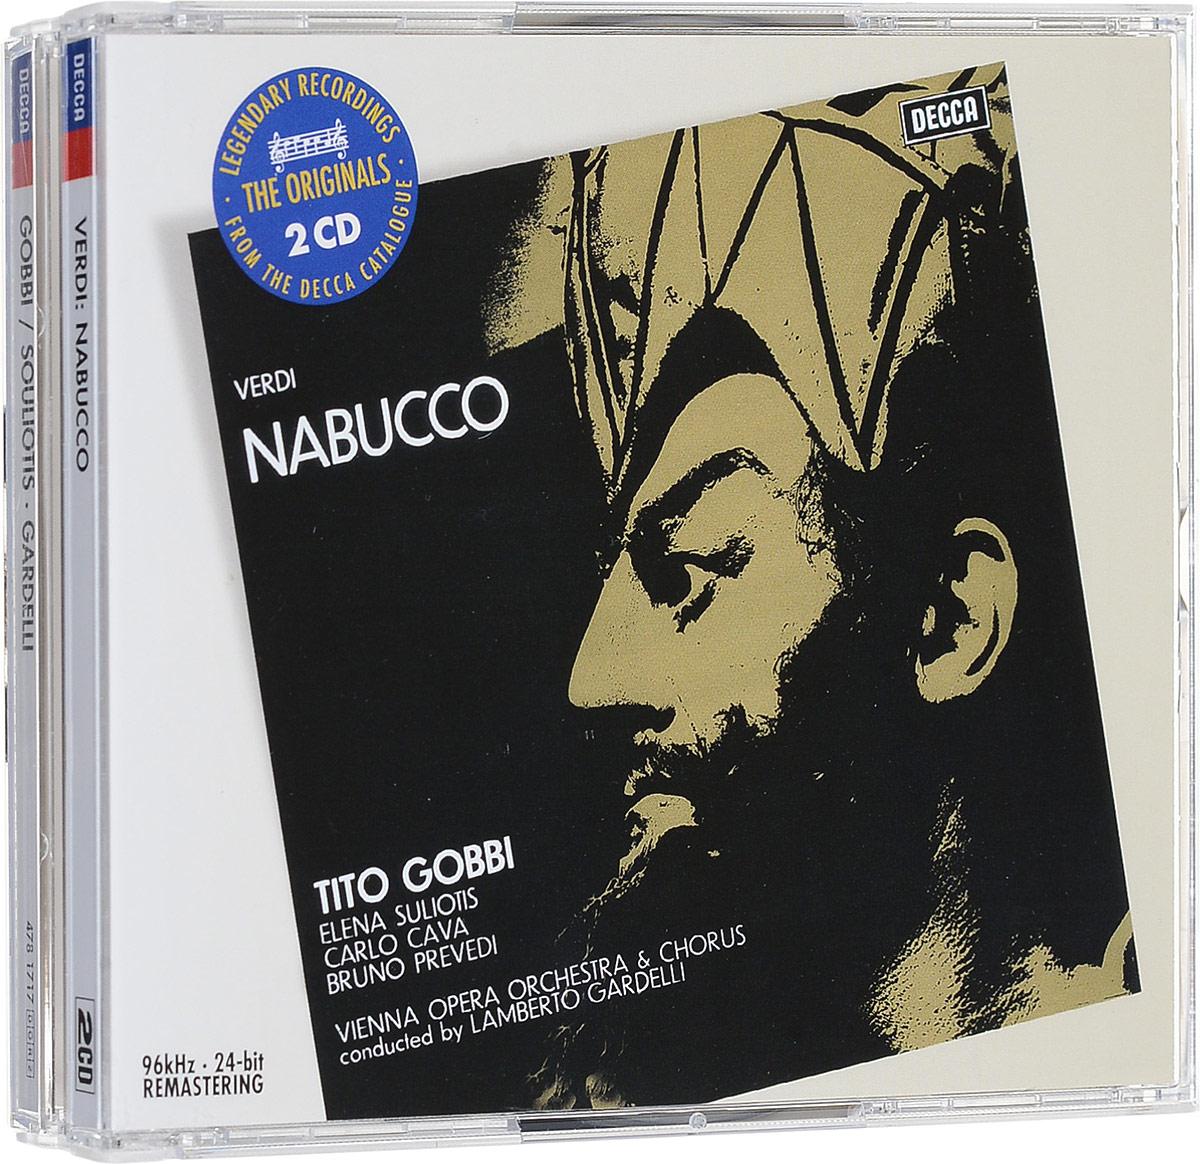 Ламберто Гарделли Lamberto Gardelli. Verdi. Nabucco (2 CD) verdi nabucco arena di verona